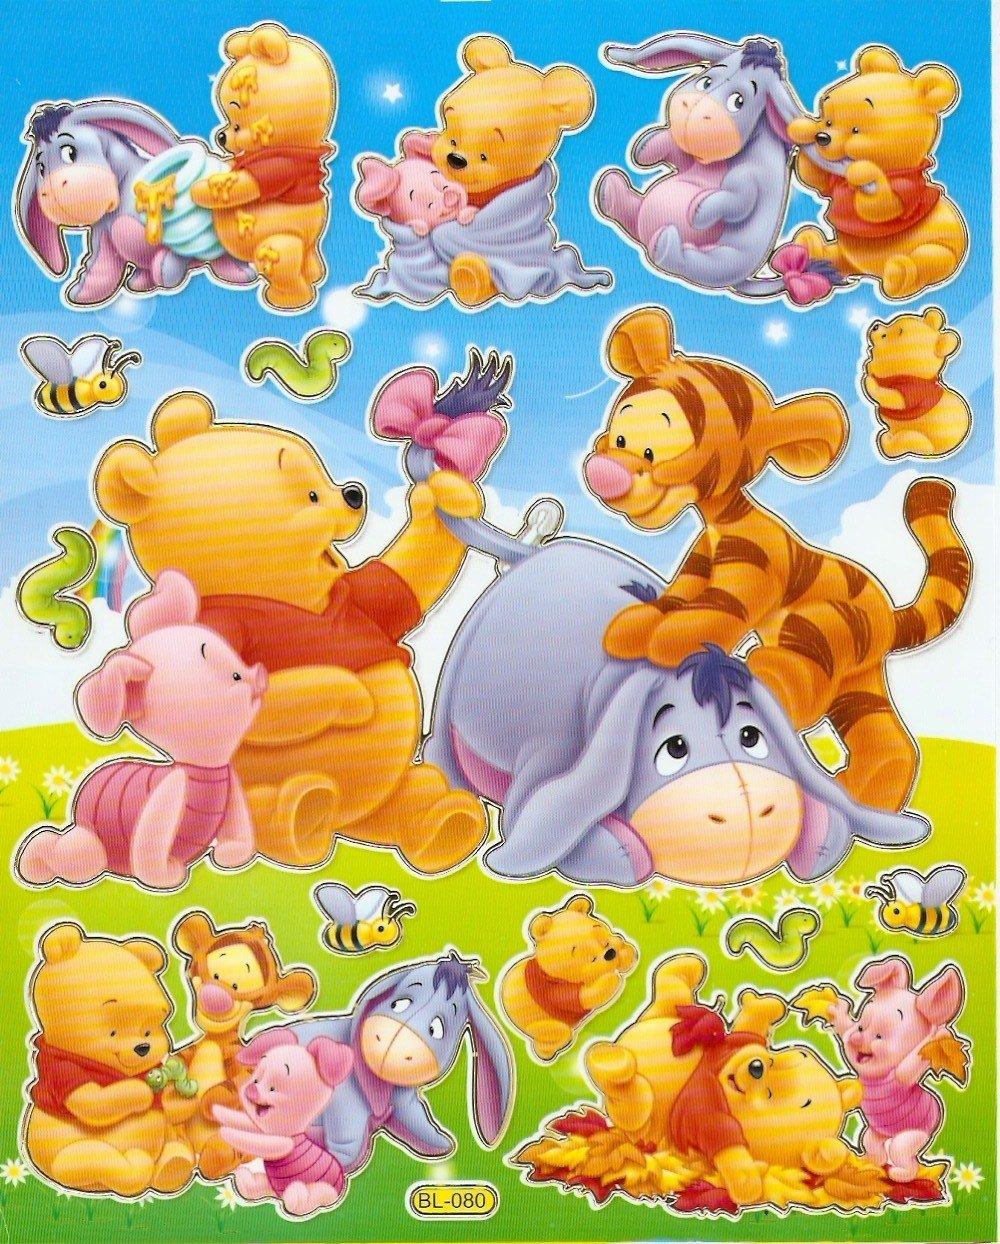 10 Big sheets Baby Pooh Sticker Buy 2 lots Bonus 1 #WP BL080